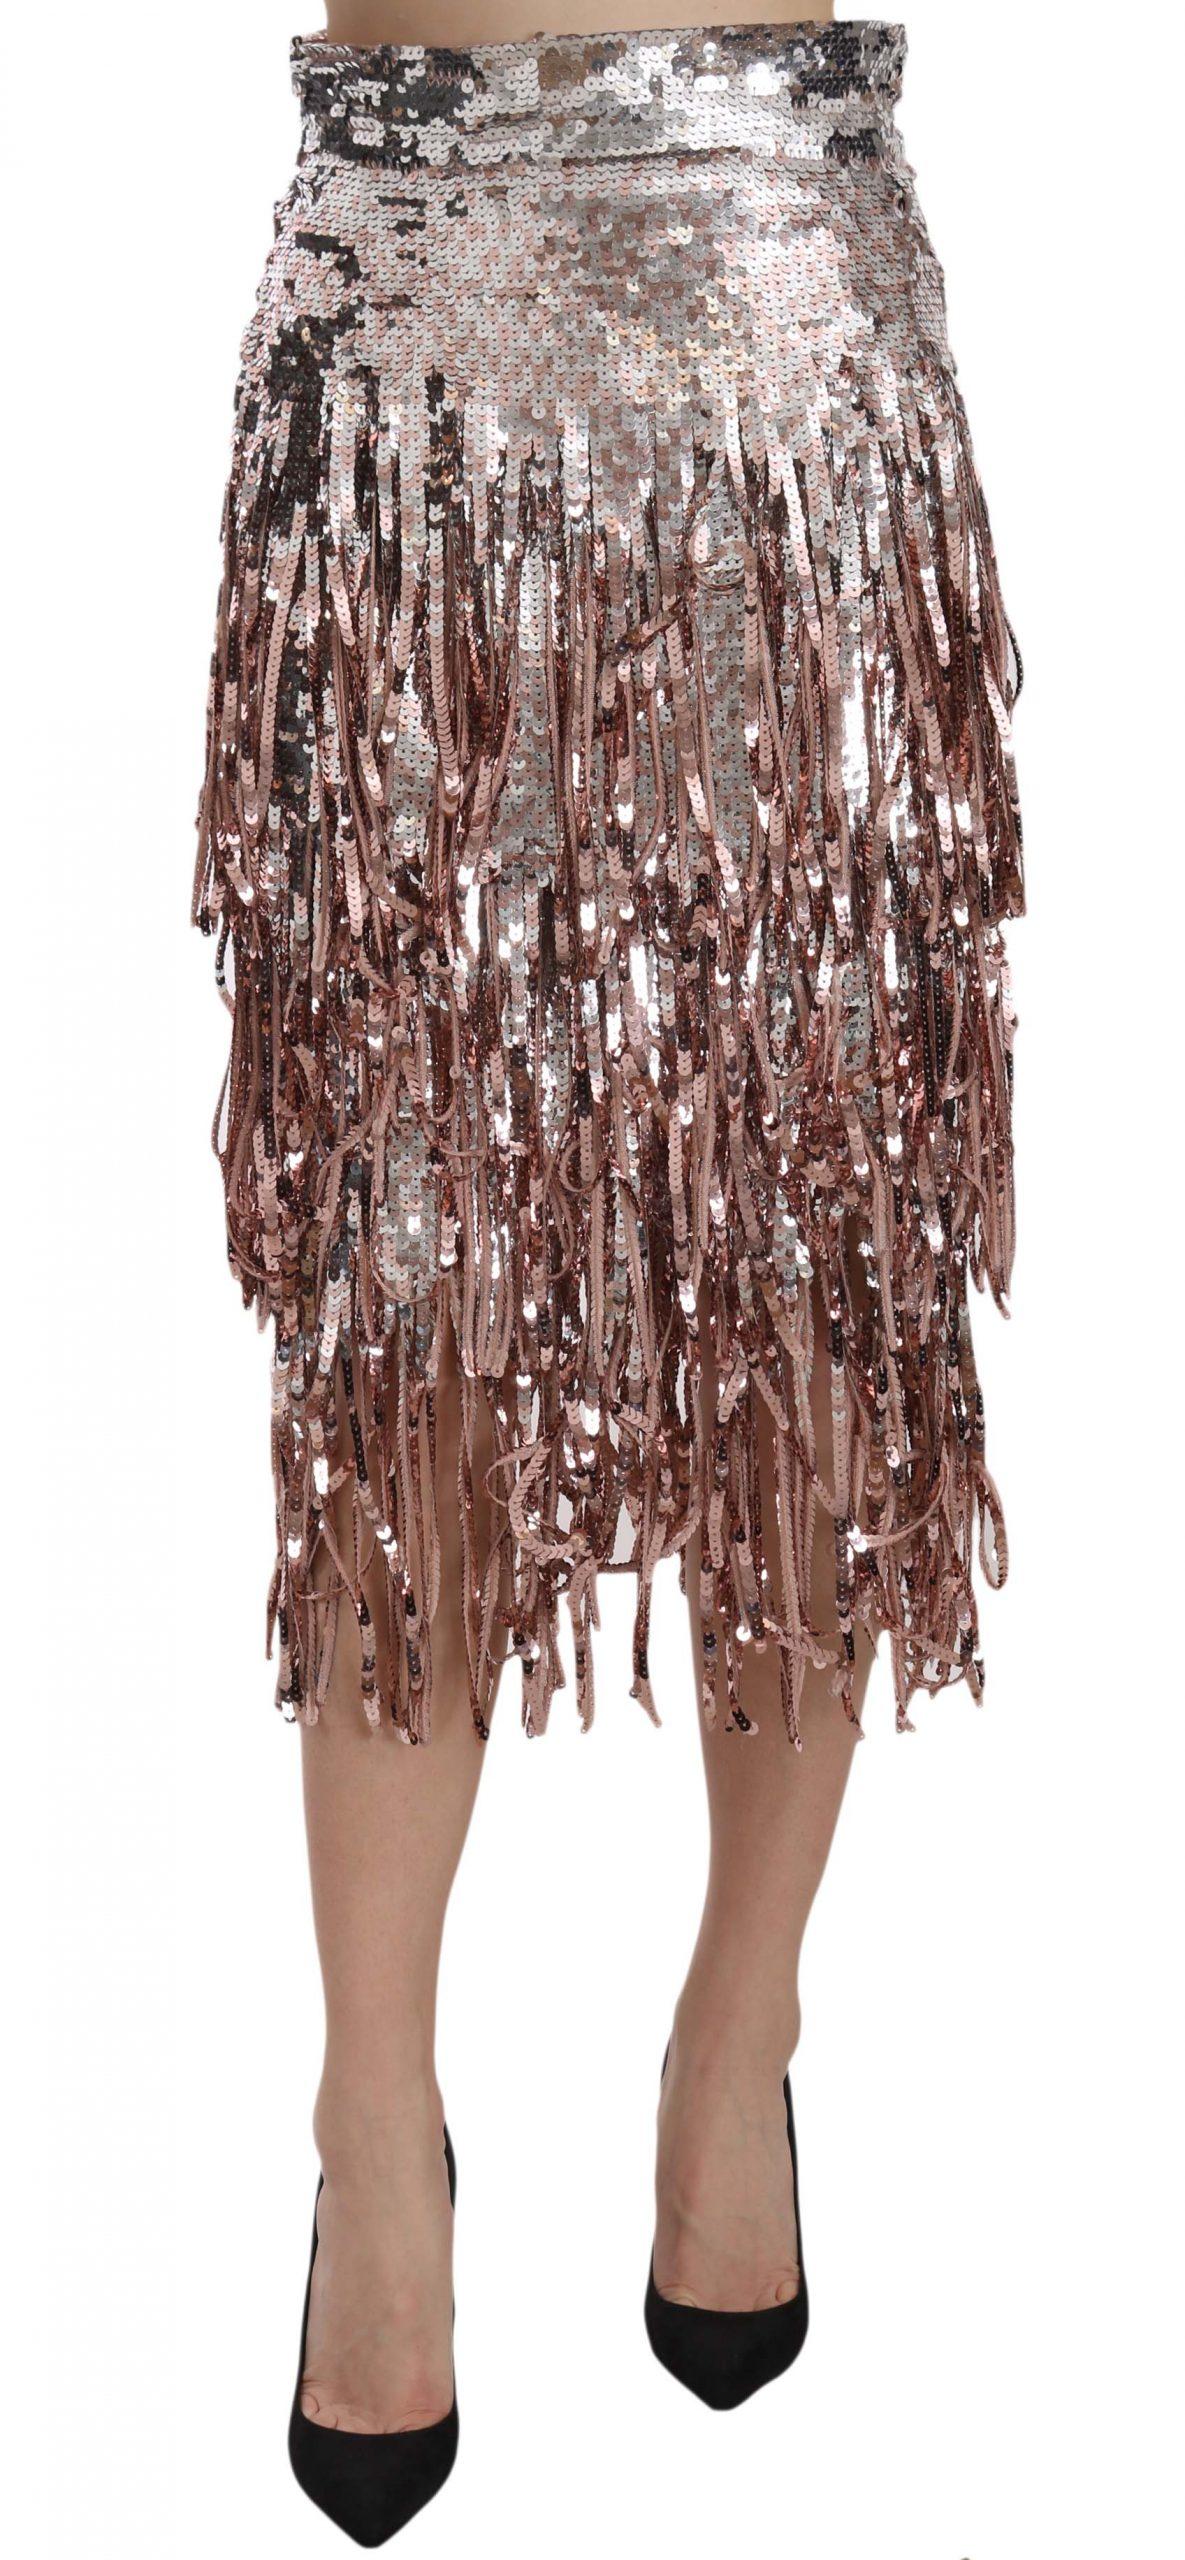 Dolce & Gabbana Women's Embellished Fringe Midi Pencil Skirt Silver SKI1173 - IT44|L